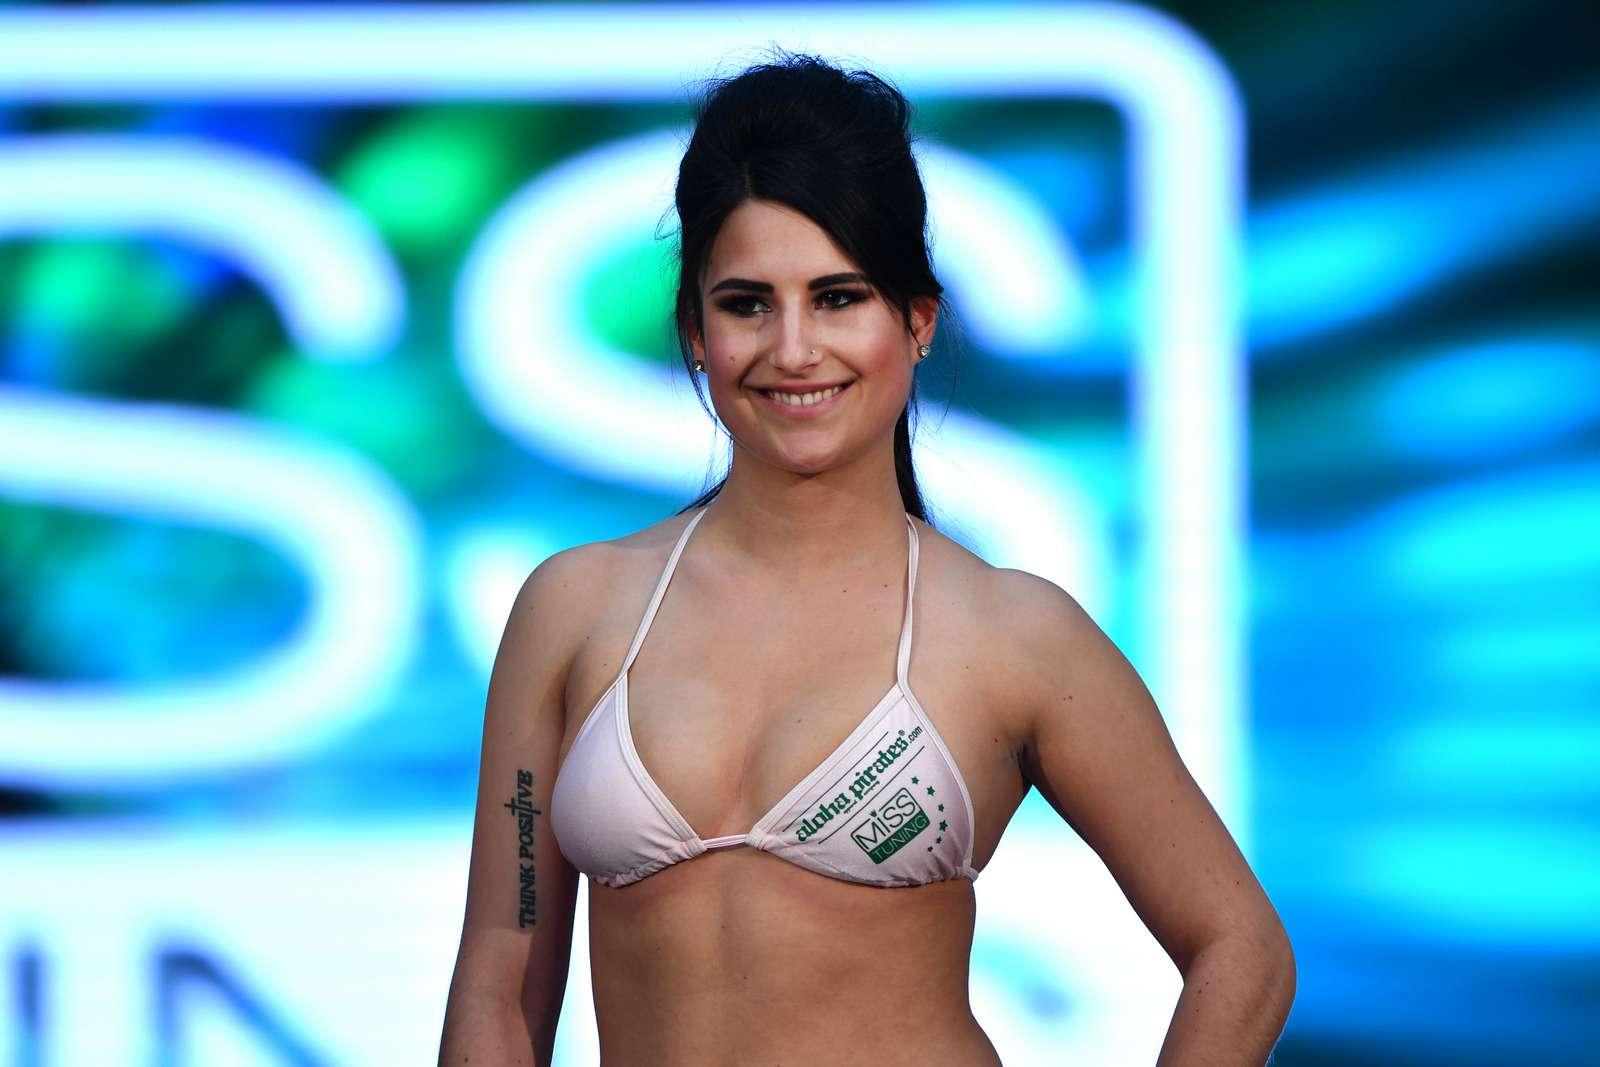 Miss Tuning 2017: фотогалерея финалисток ипобедительницы— фото 746716